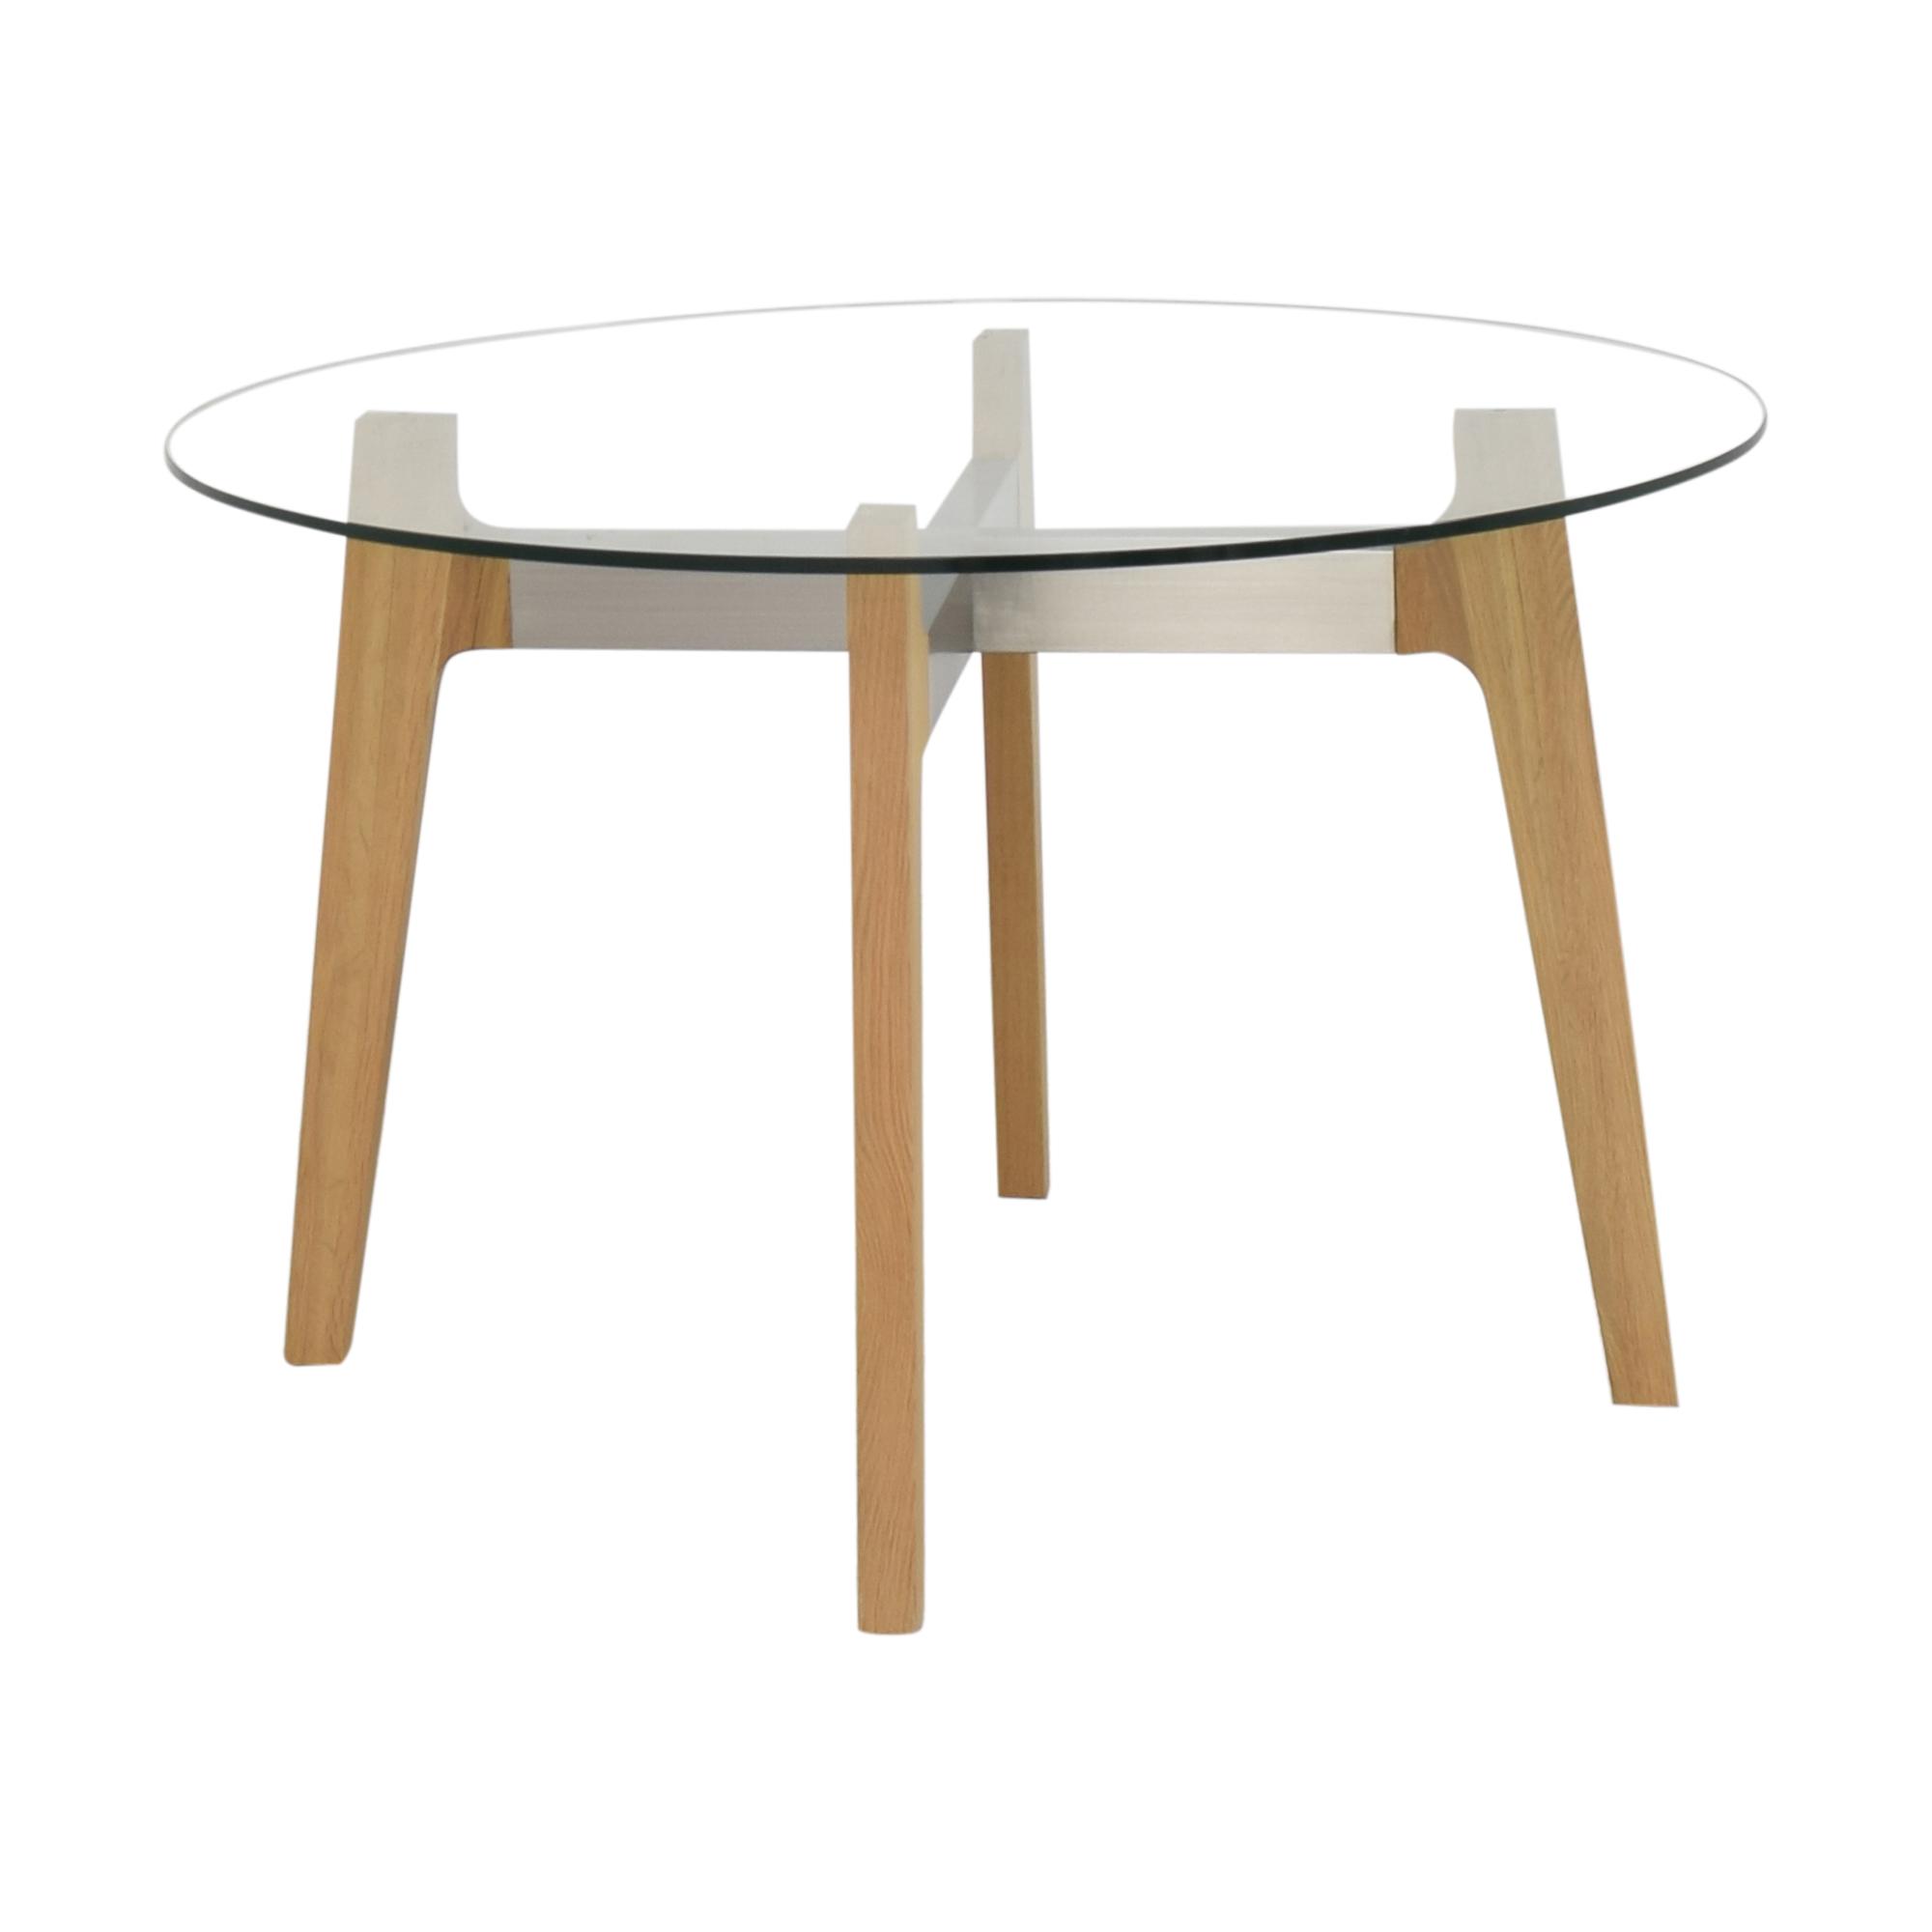 buy CB2 Brace Round Dining Table CB2 Dinner Tables